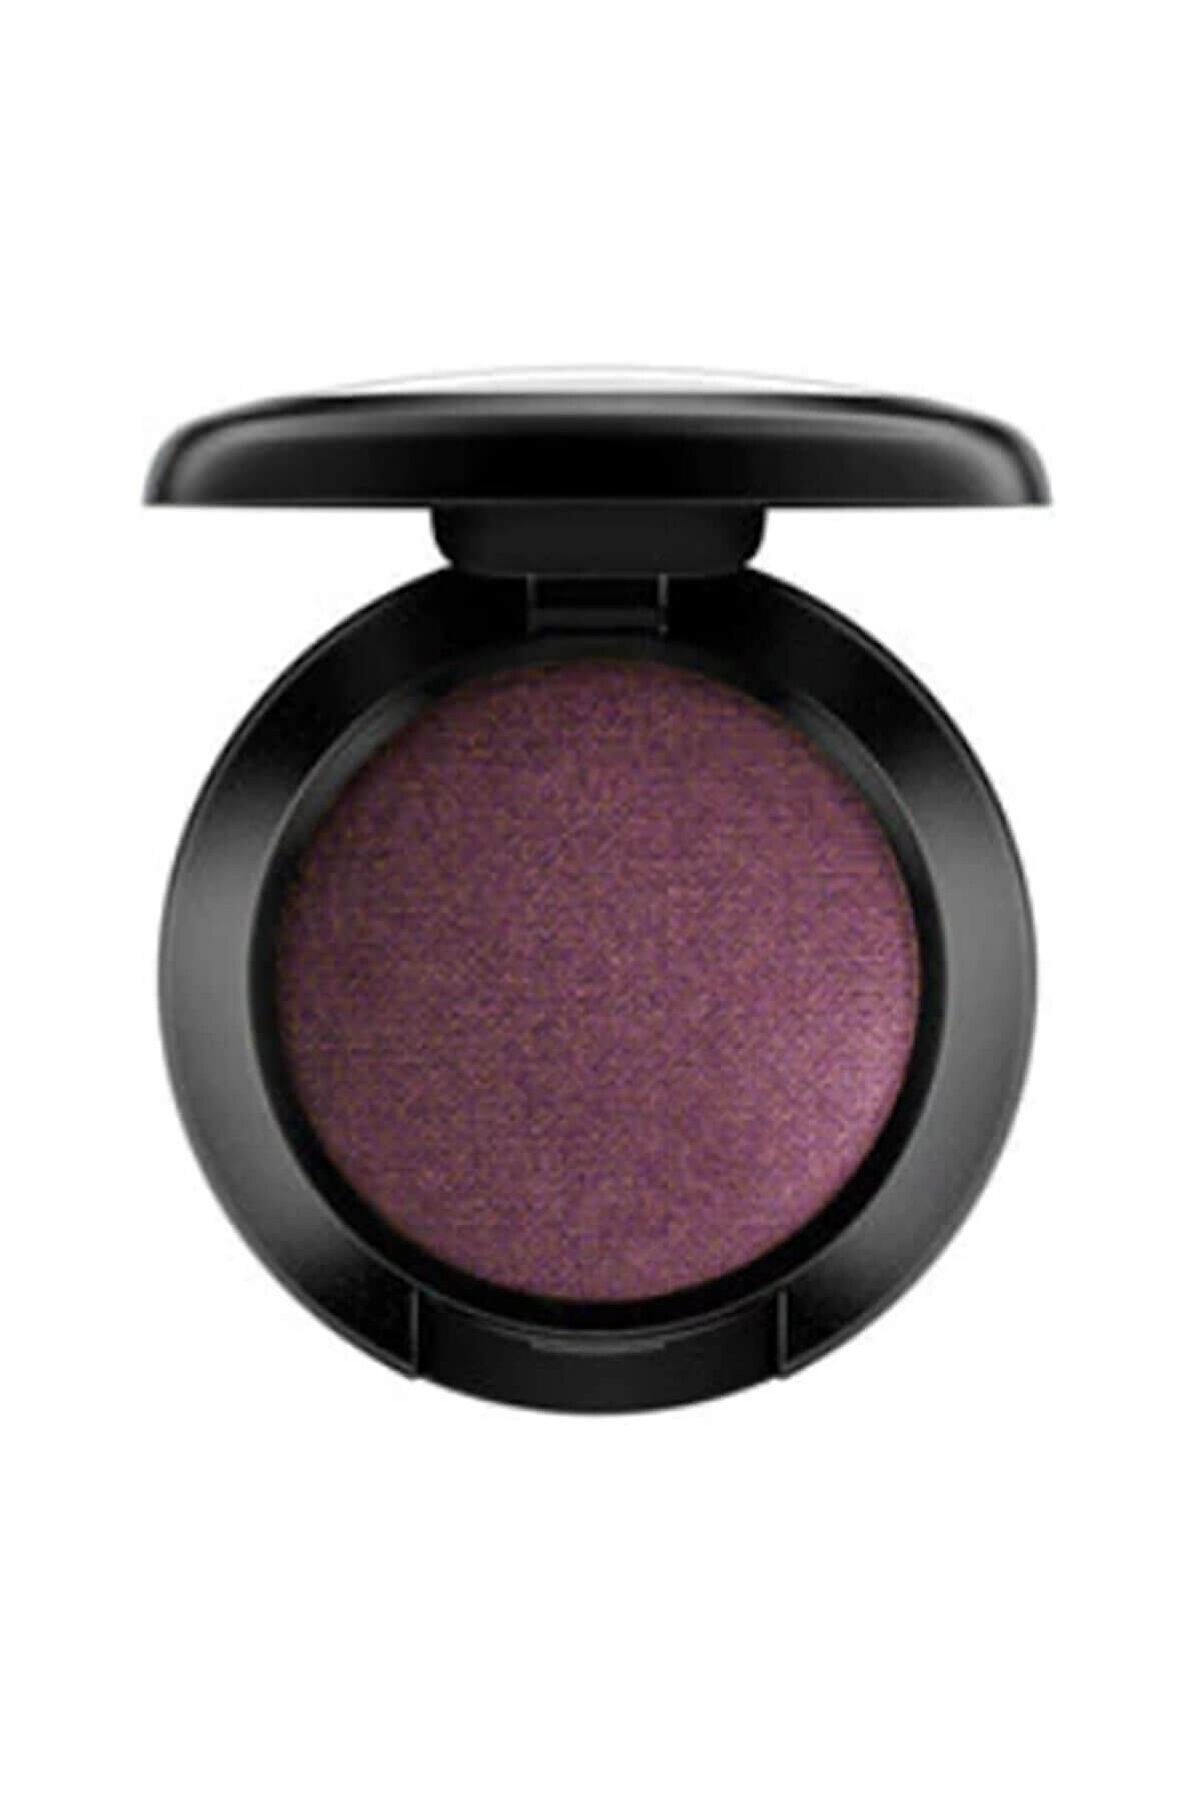 Mac Göz Farı - Eye Shadow Beauty Marked 1.5 g 773602023653